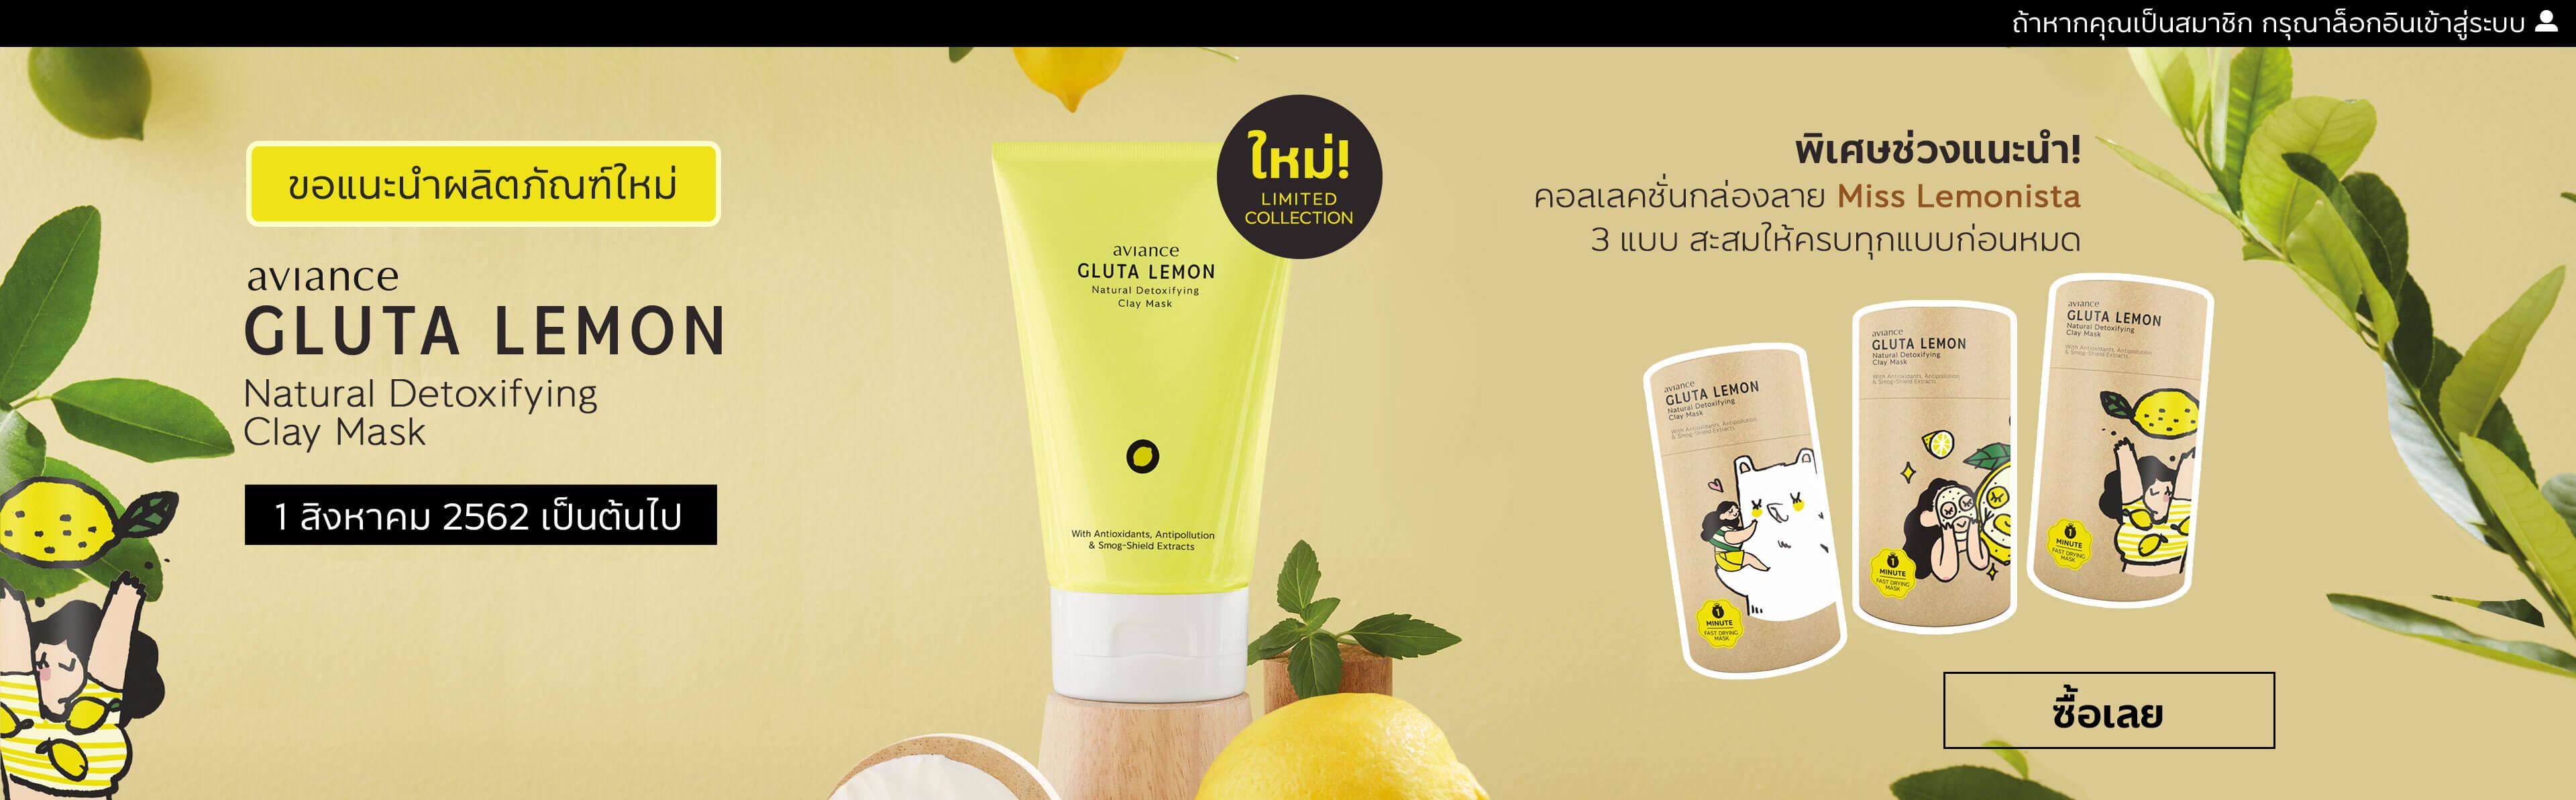 GLUTA LEMON Natural Detoxifying Clay Mask